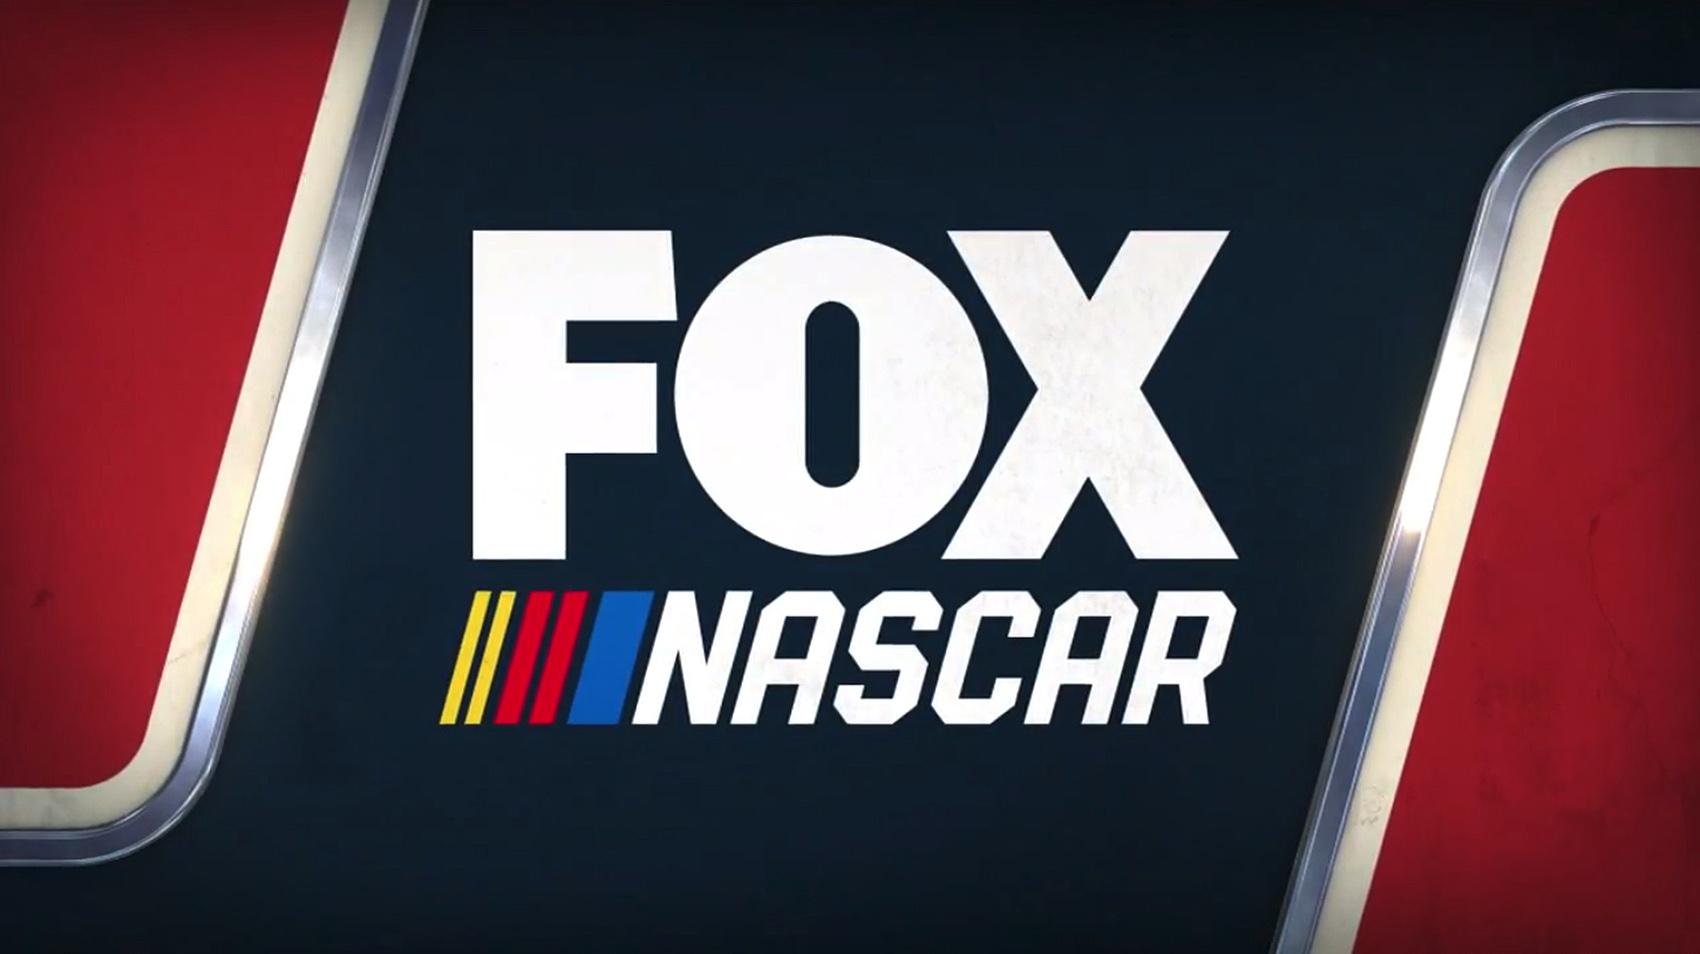 NCS_NASCAR-Fox-2019-Broadcast-Design_013